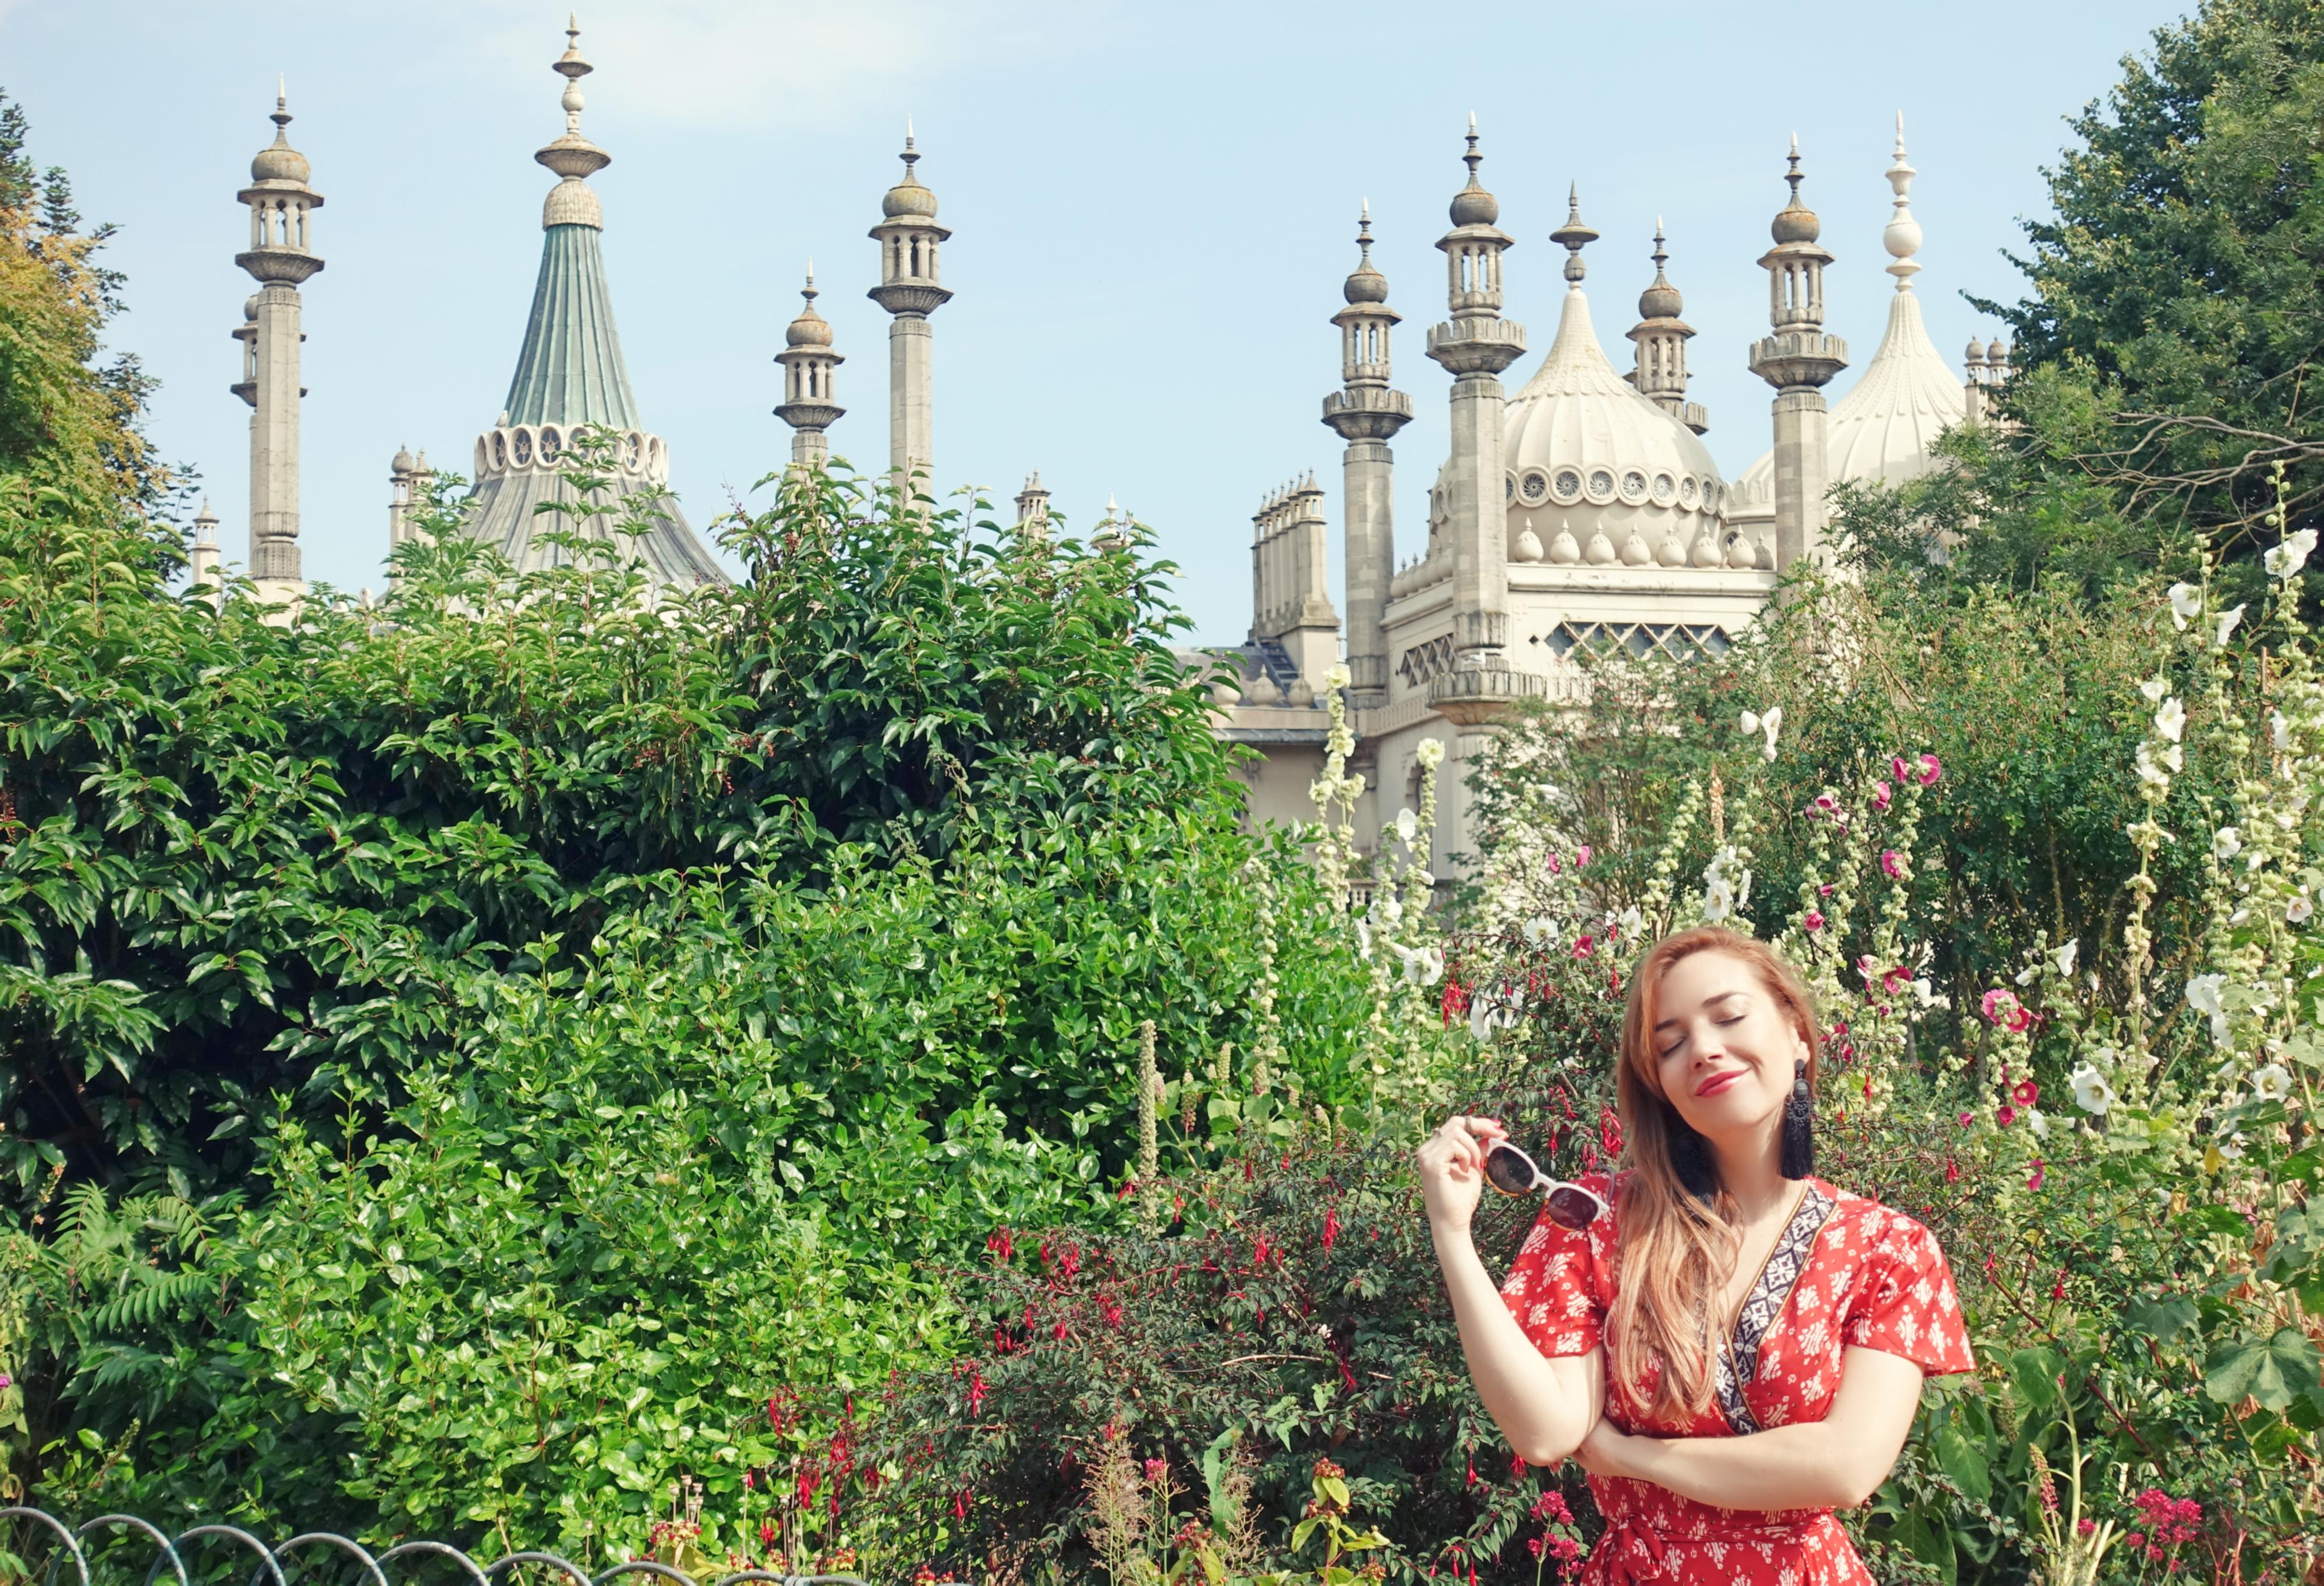 Que-ver-en-Brighton-Royal-Pavilion-fashion-travel-PiensaenChic-influencer-Chicadicta-Piensa-en-Chic-fashionista-Chic-adicta